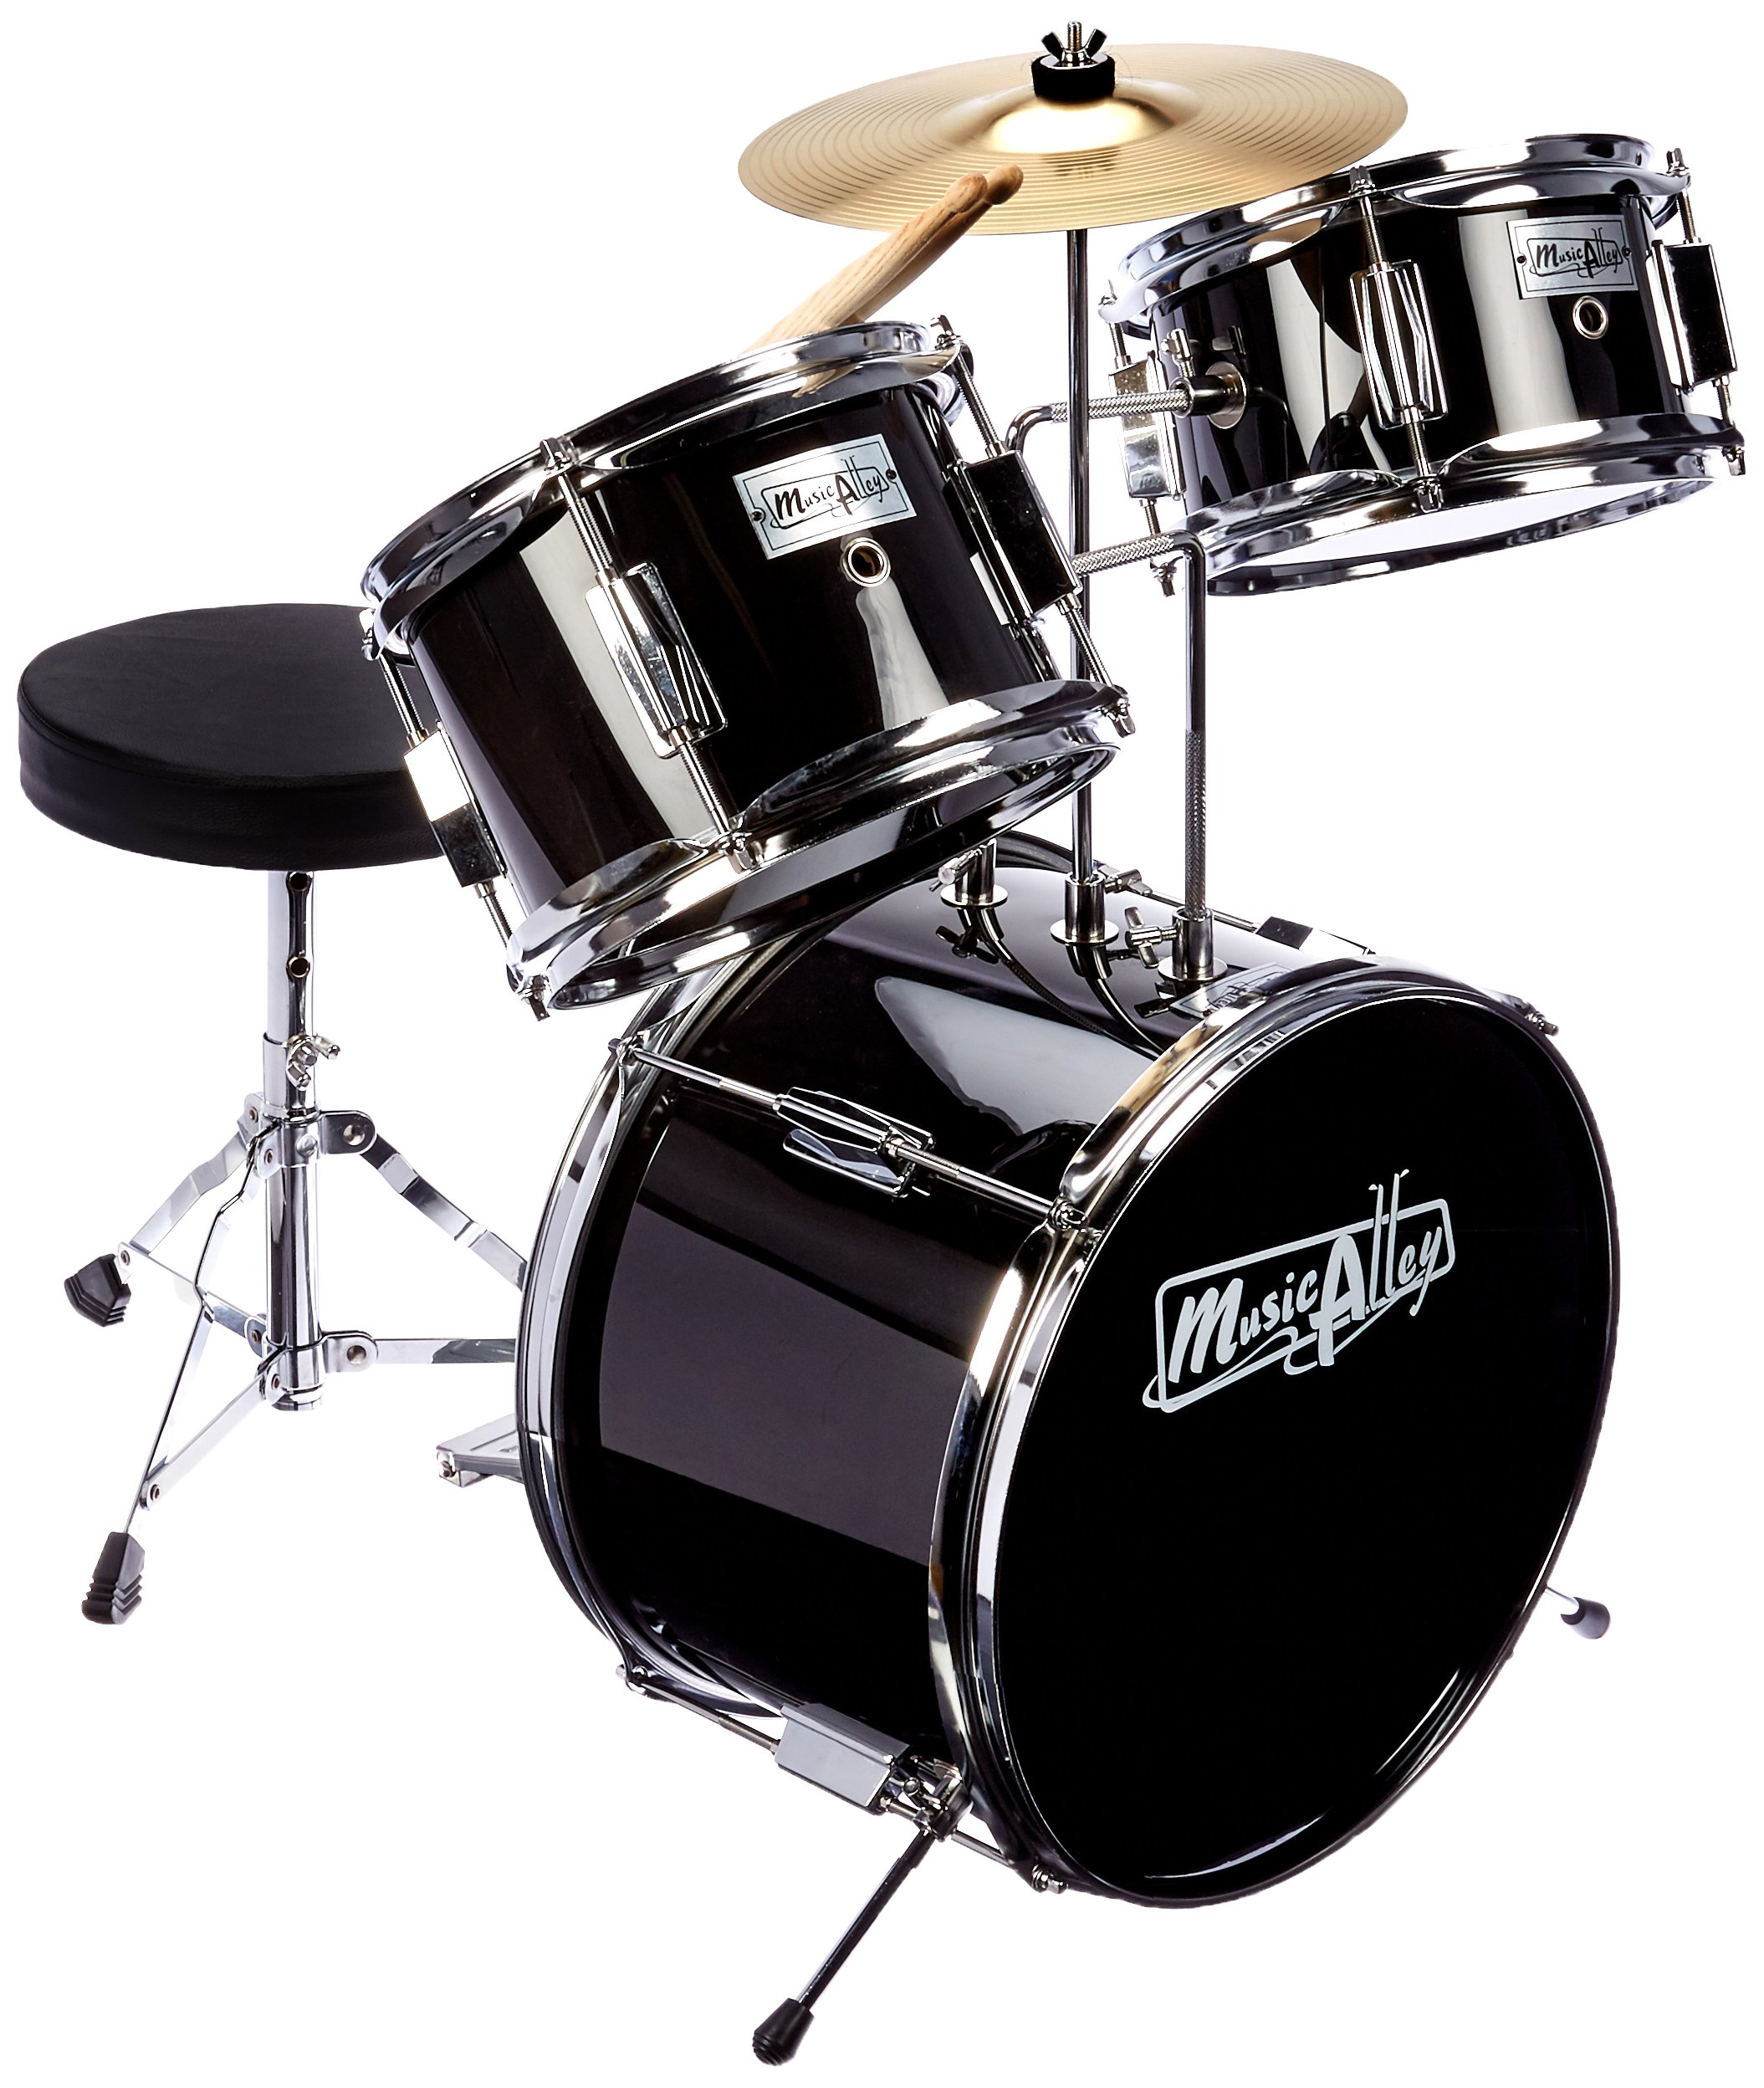 Music Alley DBJK02-BK - Juego de batería para principiantes